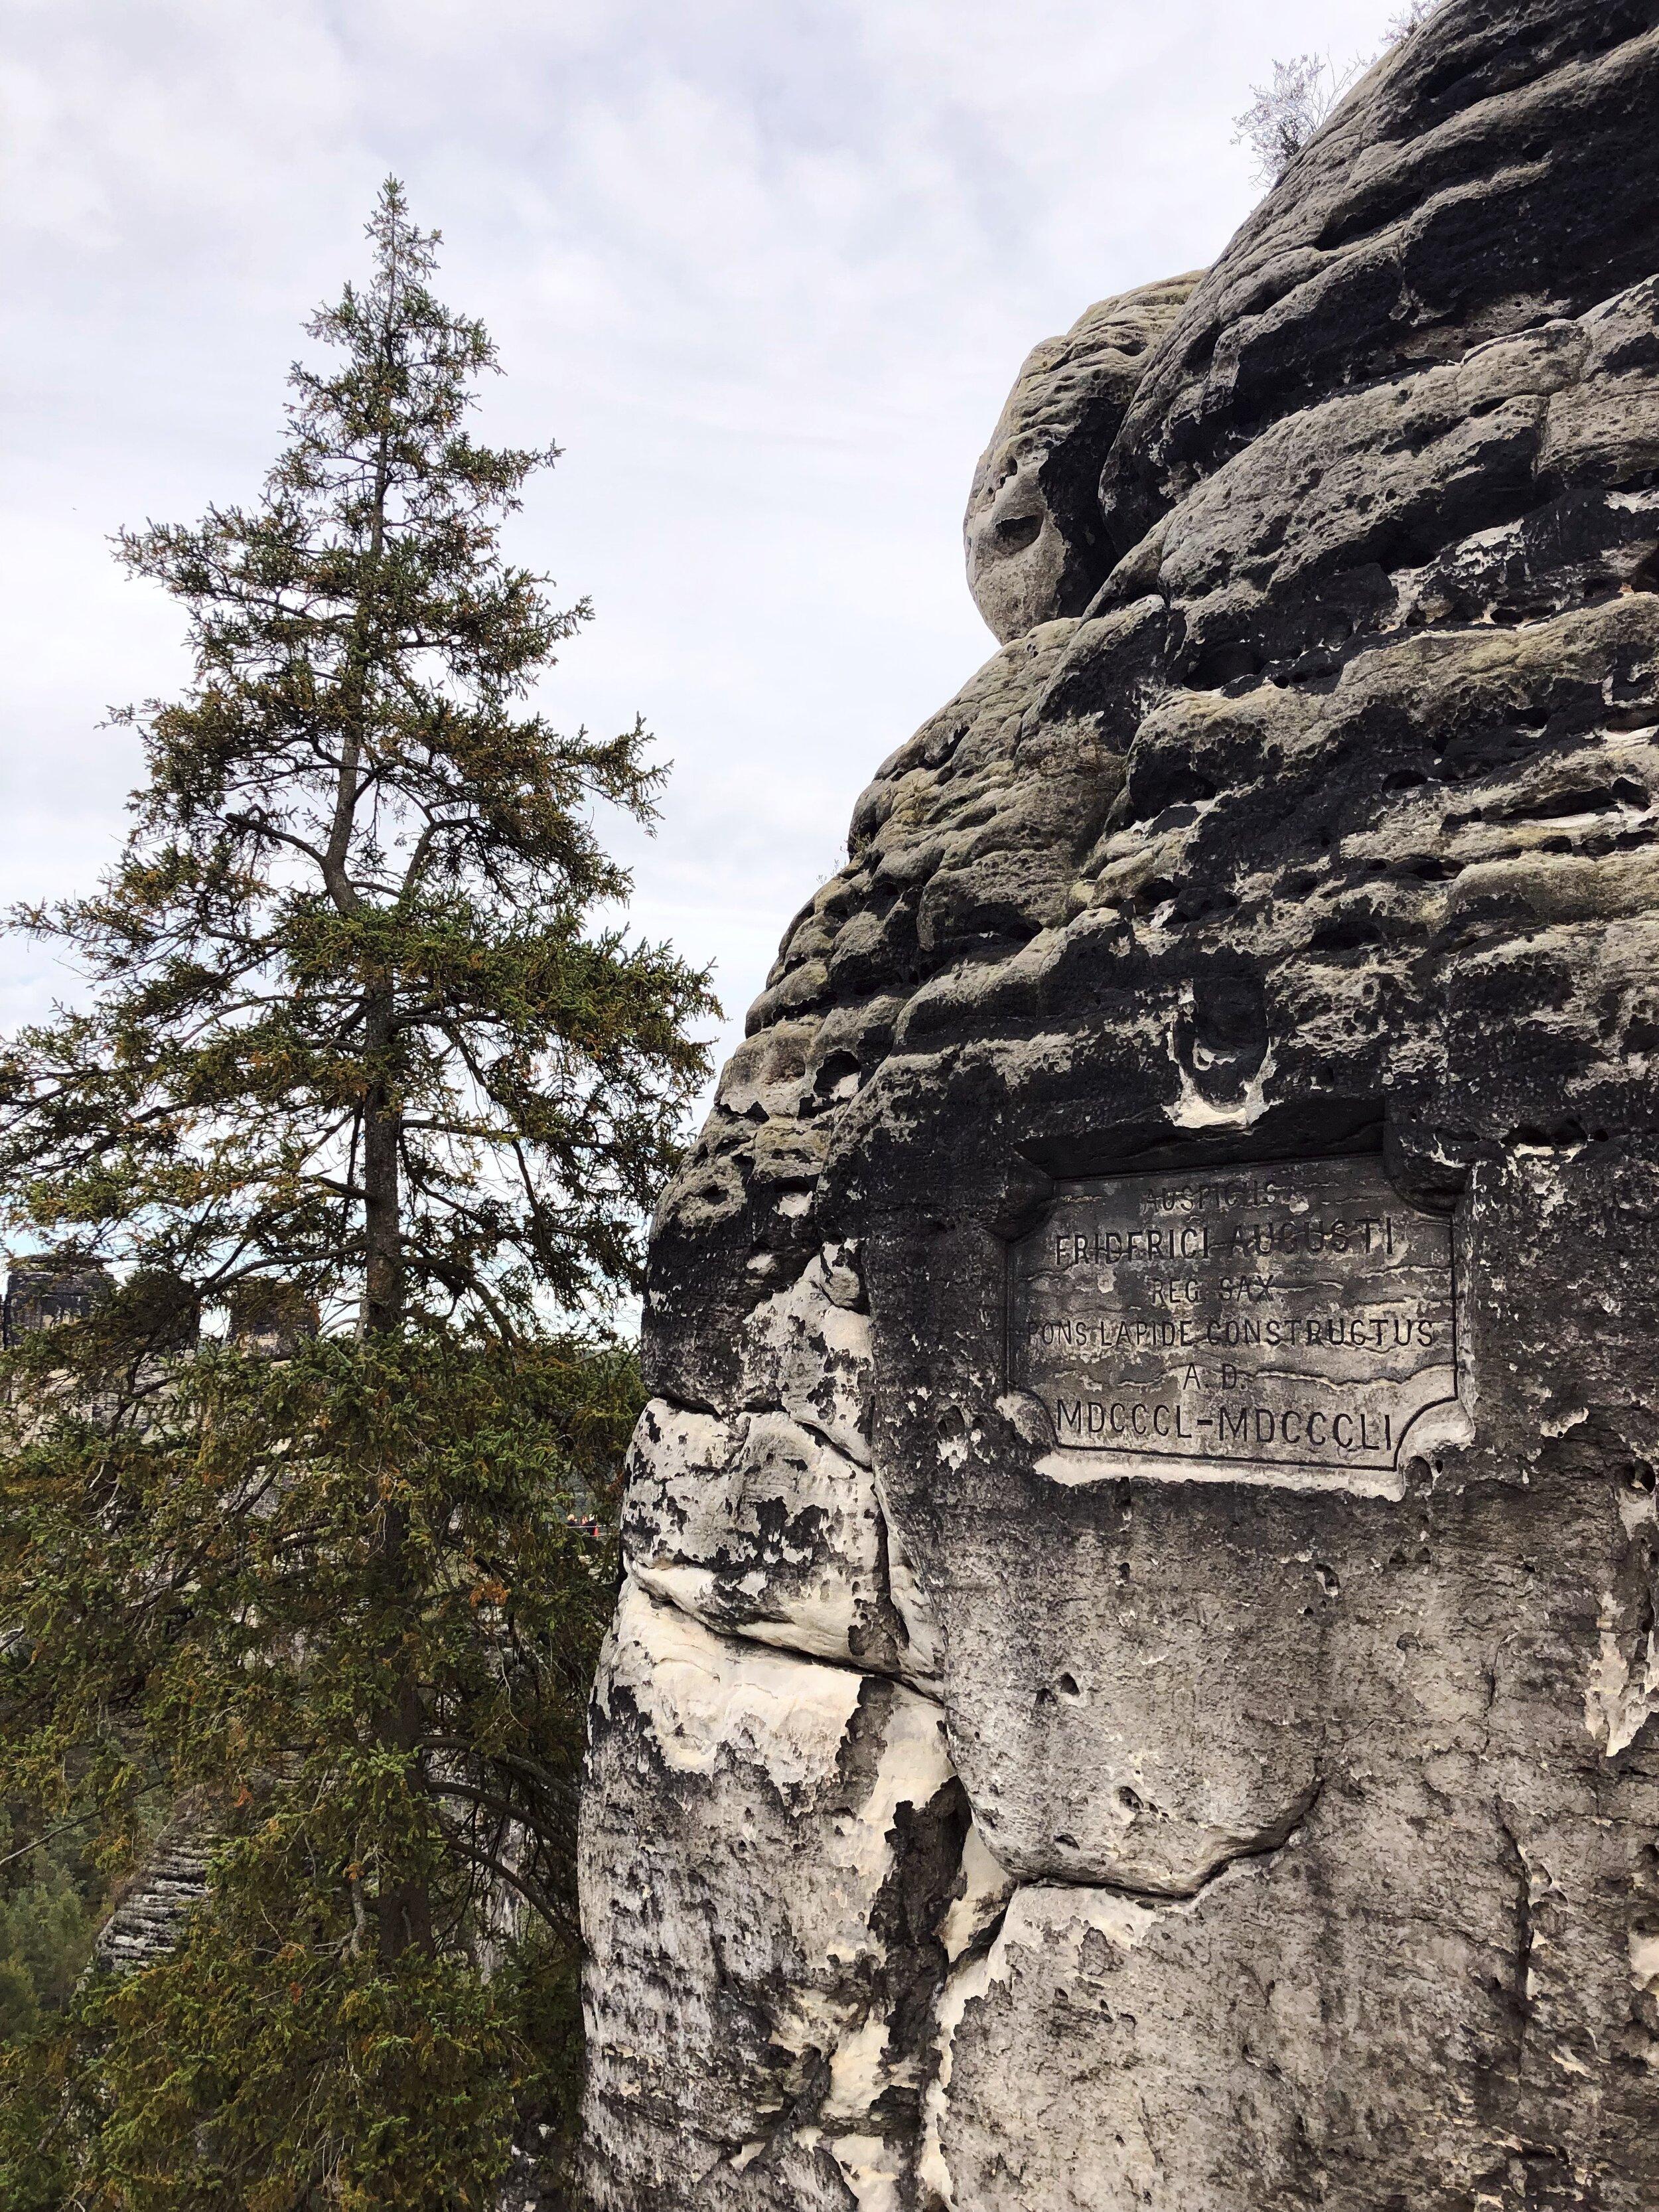 baste-bridge-lohmen-germany-hiking_0318.JPG